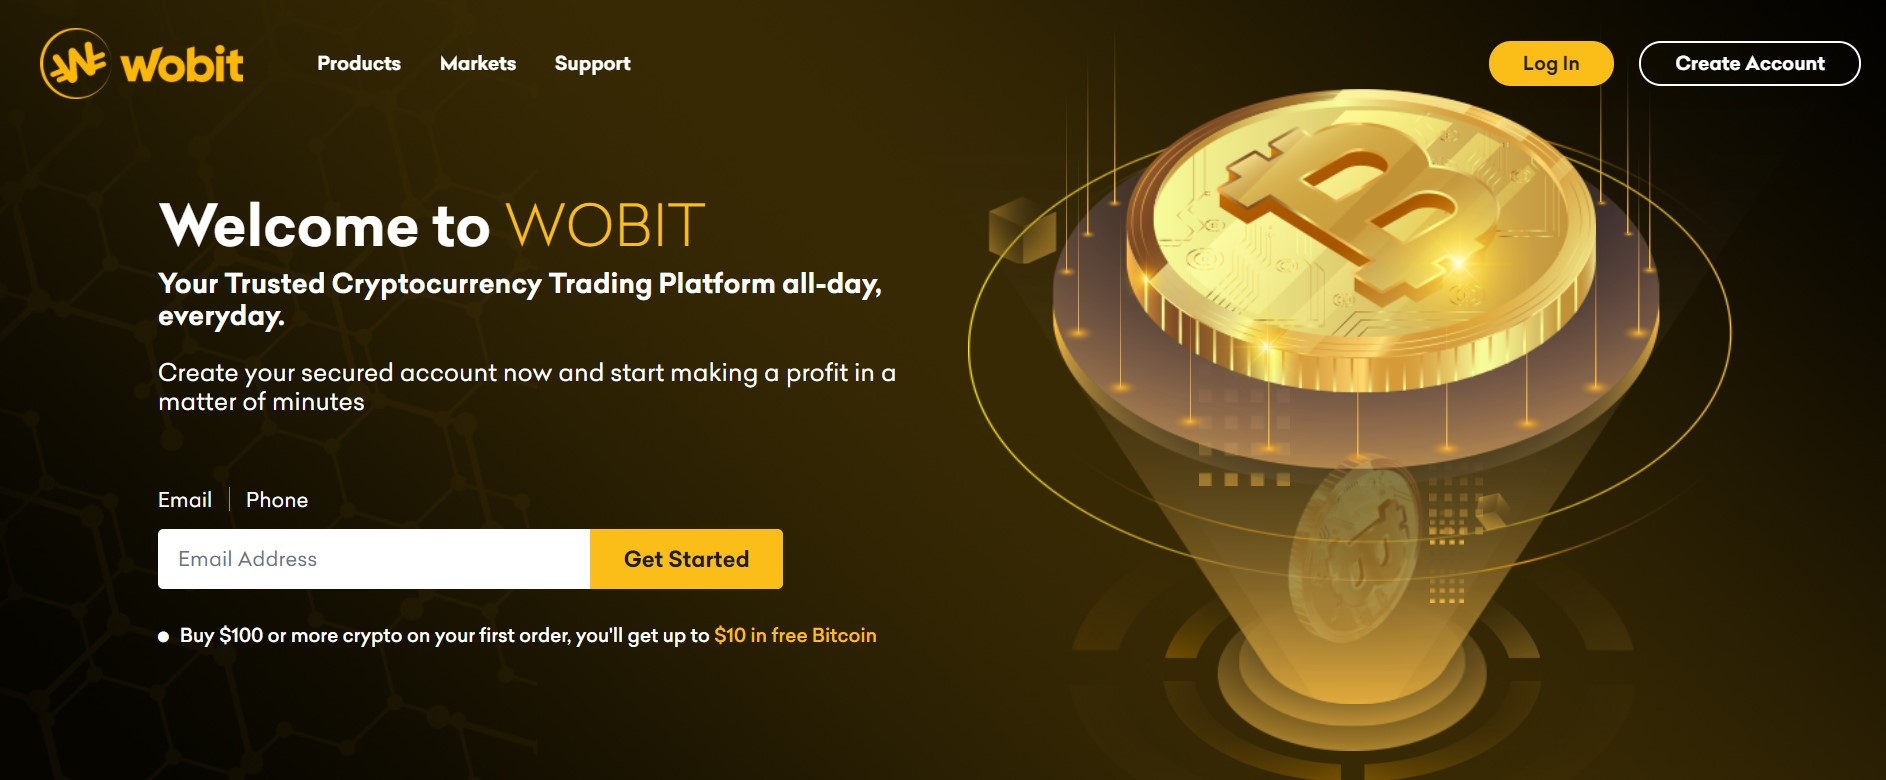 Wobit website